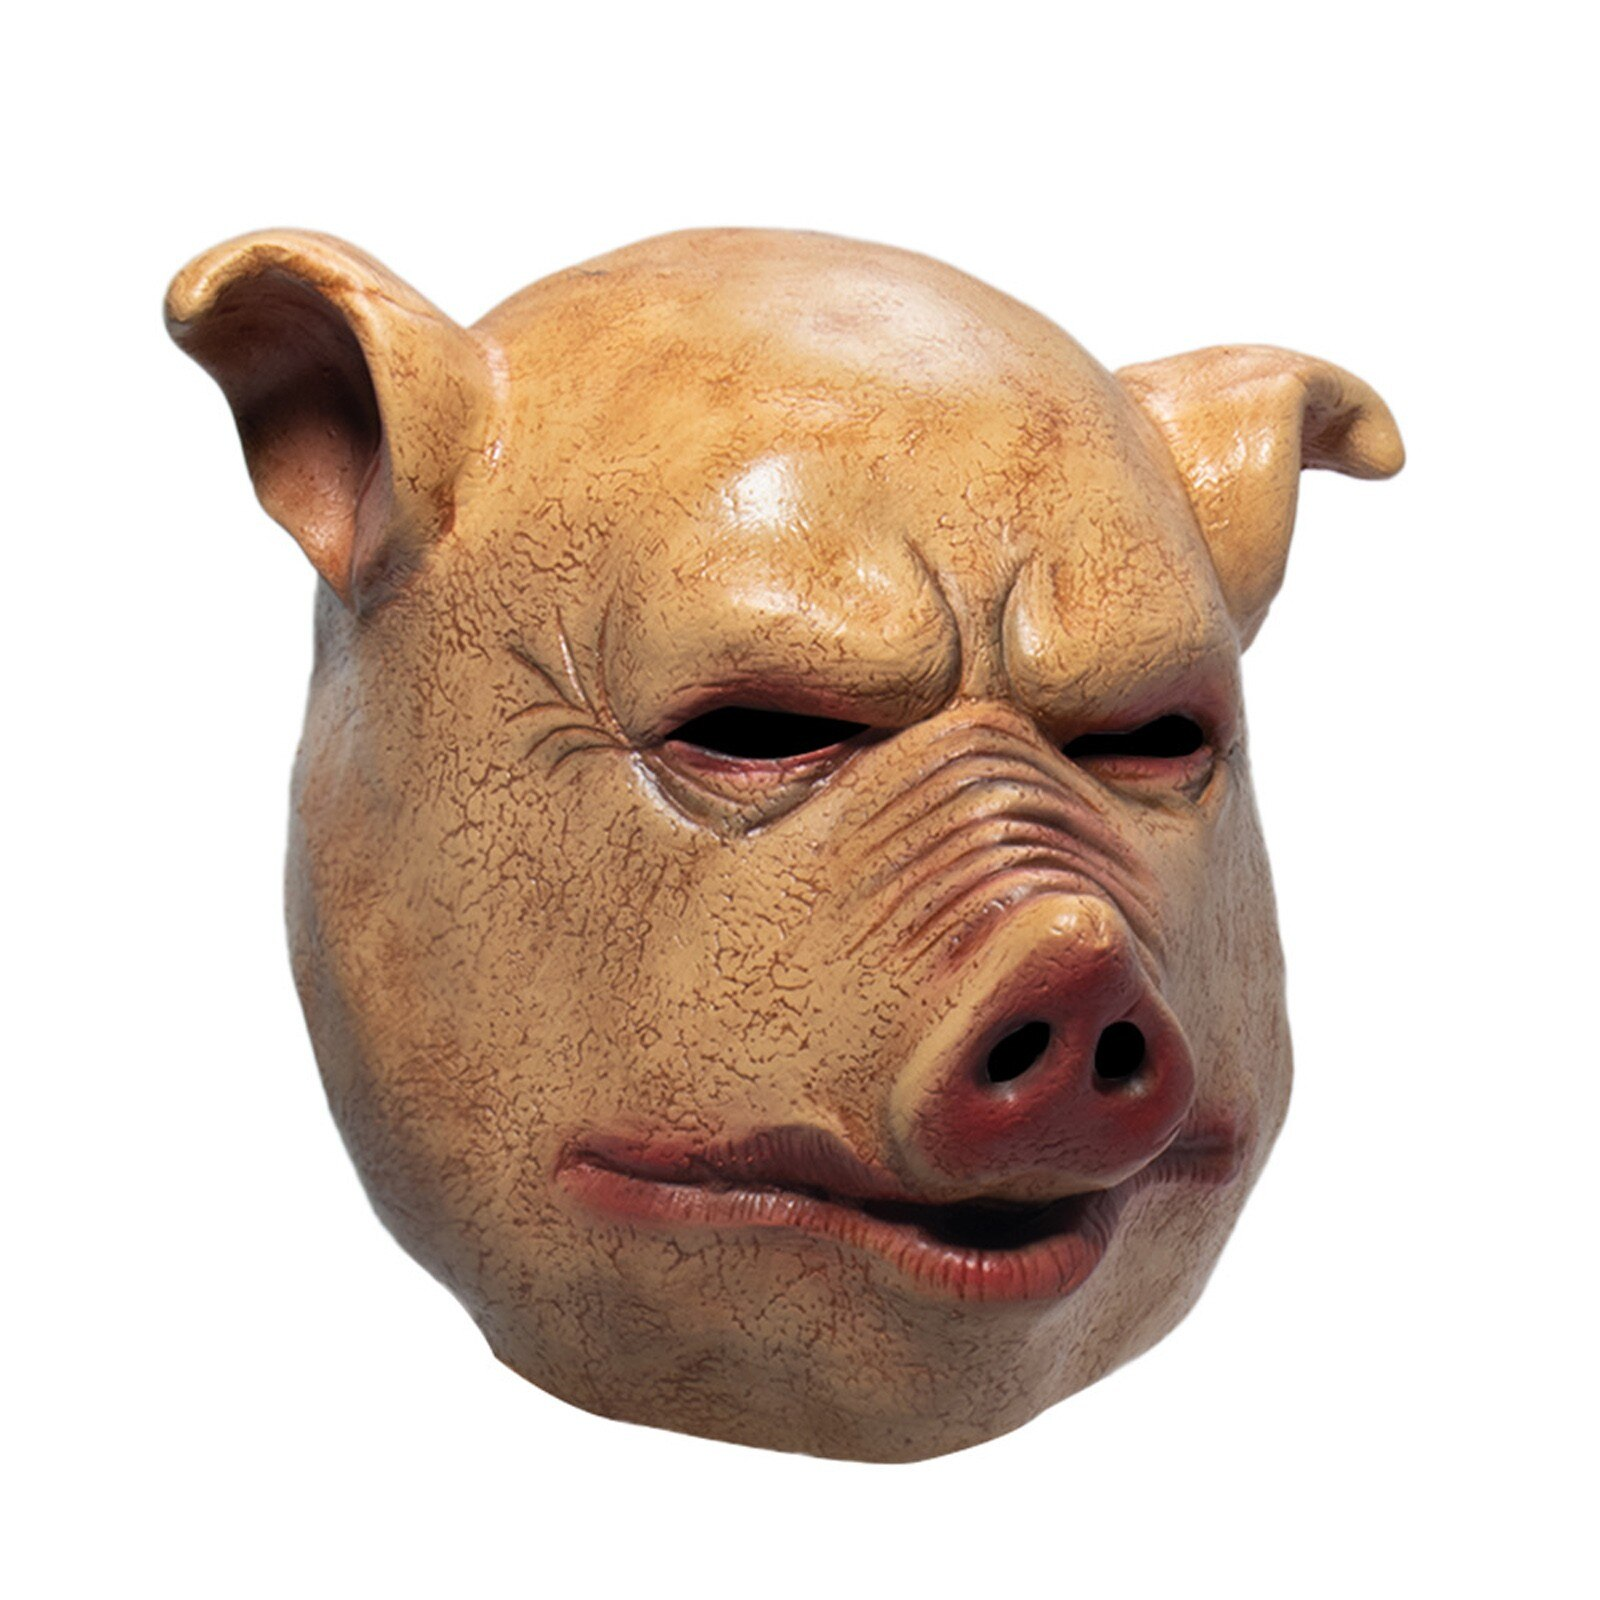 animal chapelaria adereços engraçado horror atmosfera máscara